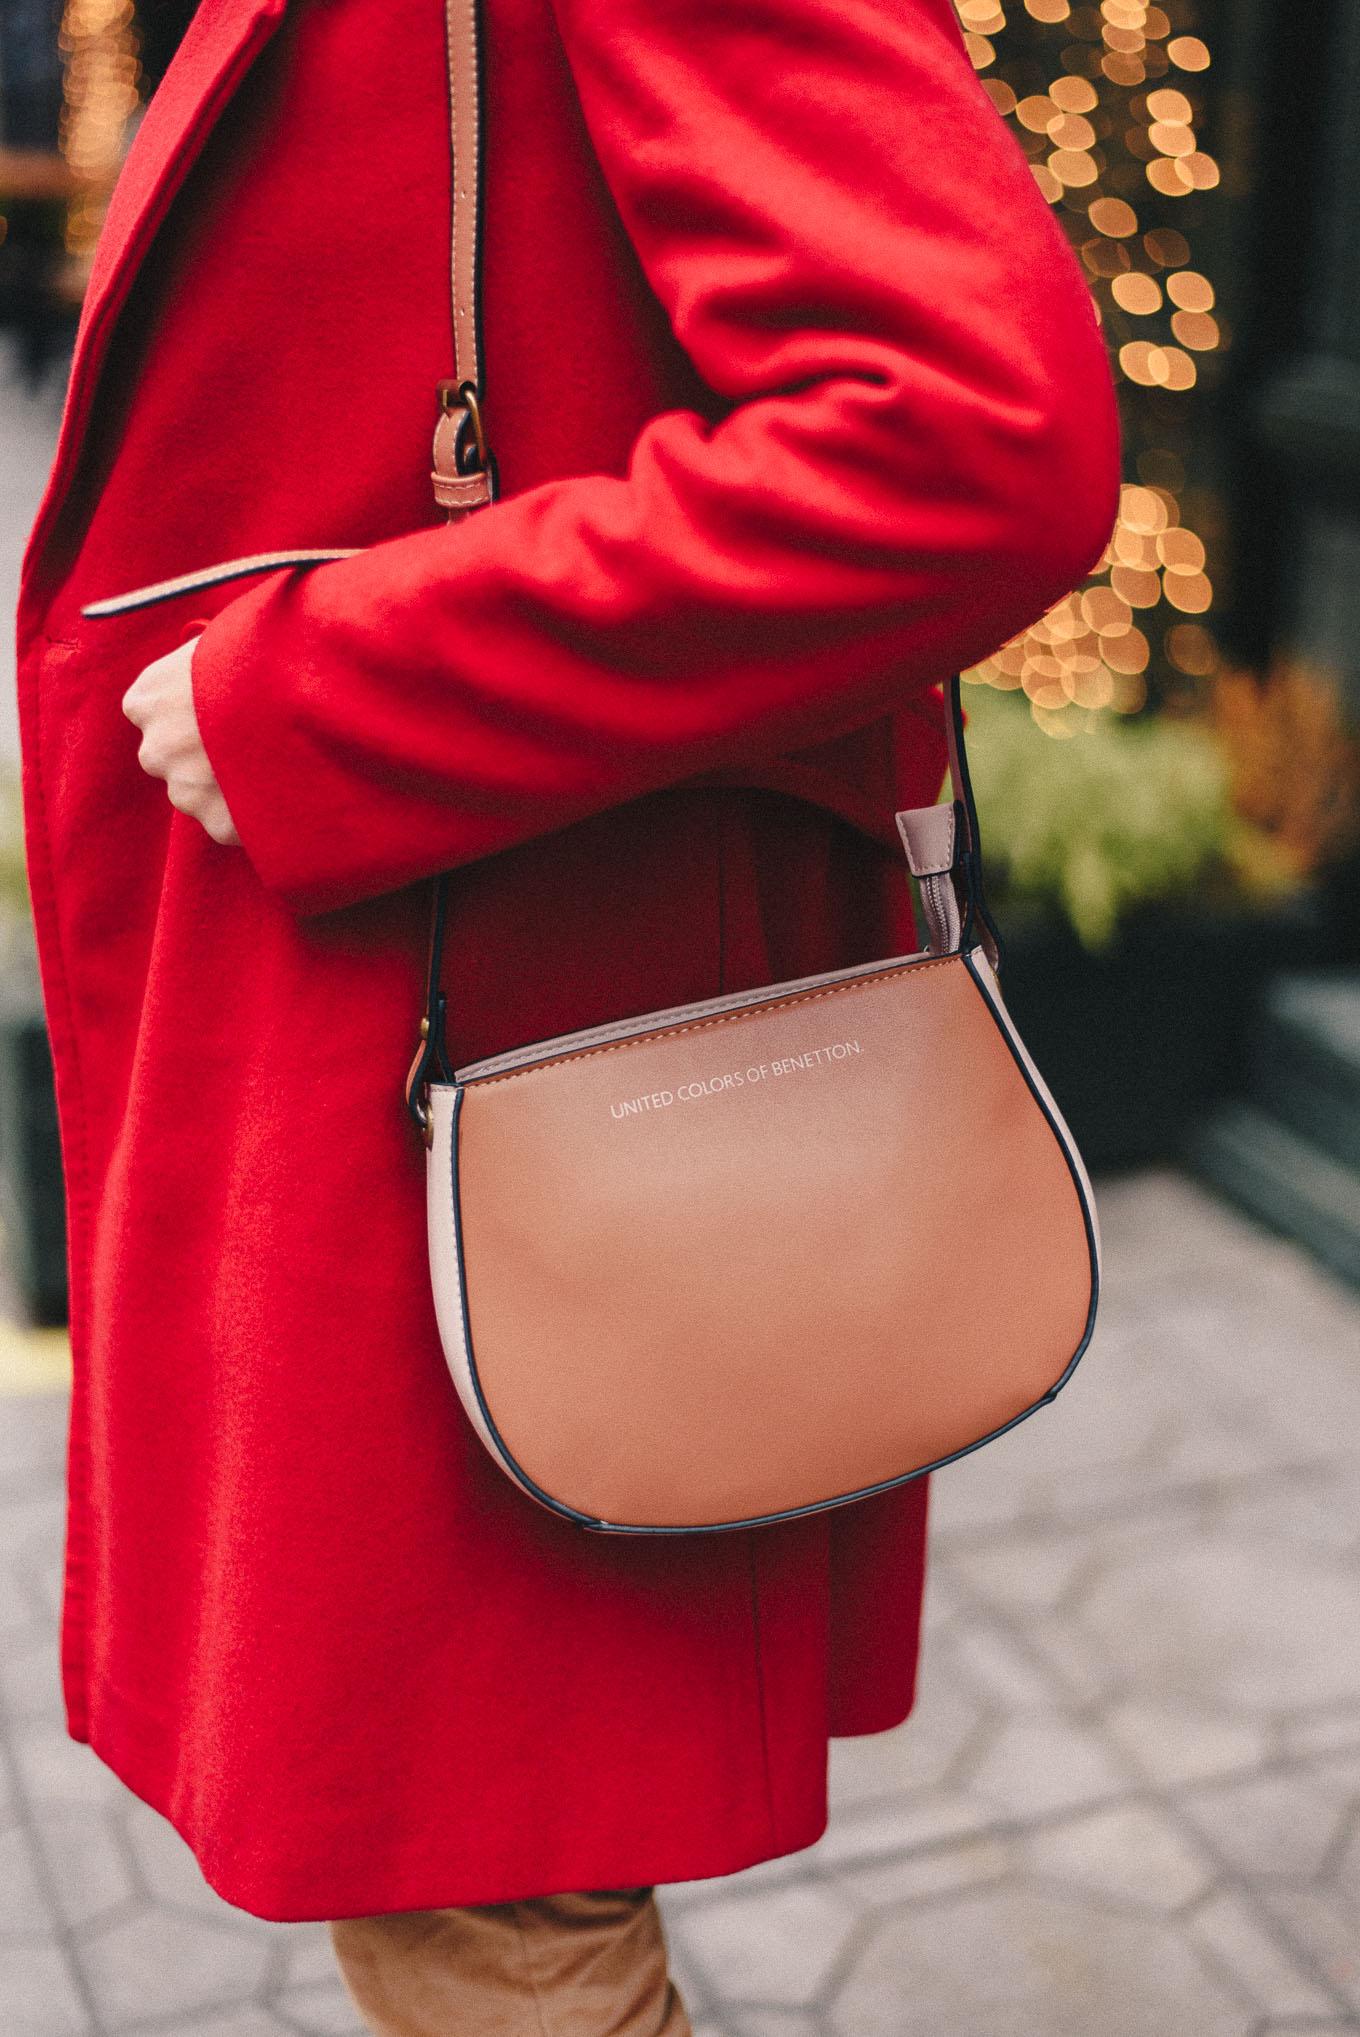 Perfect red coat